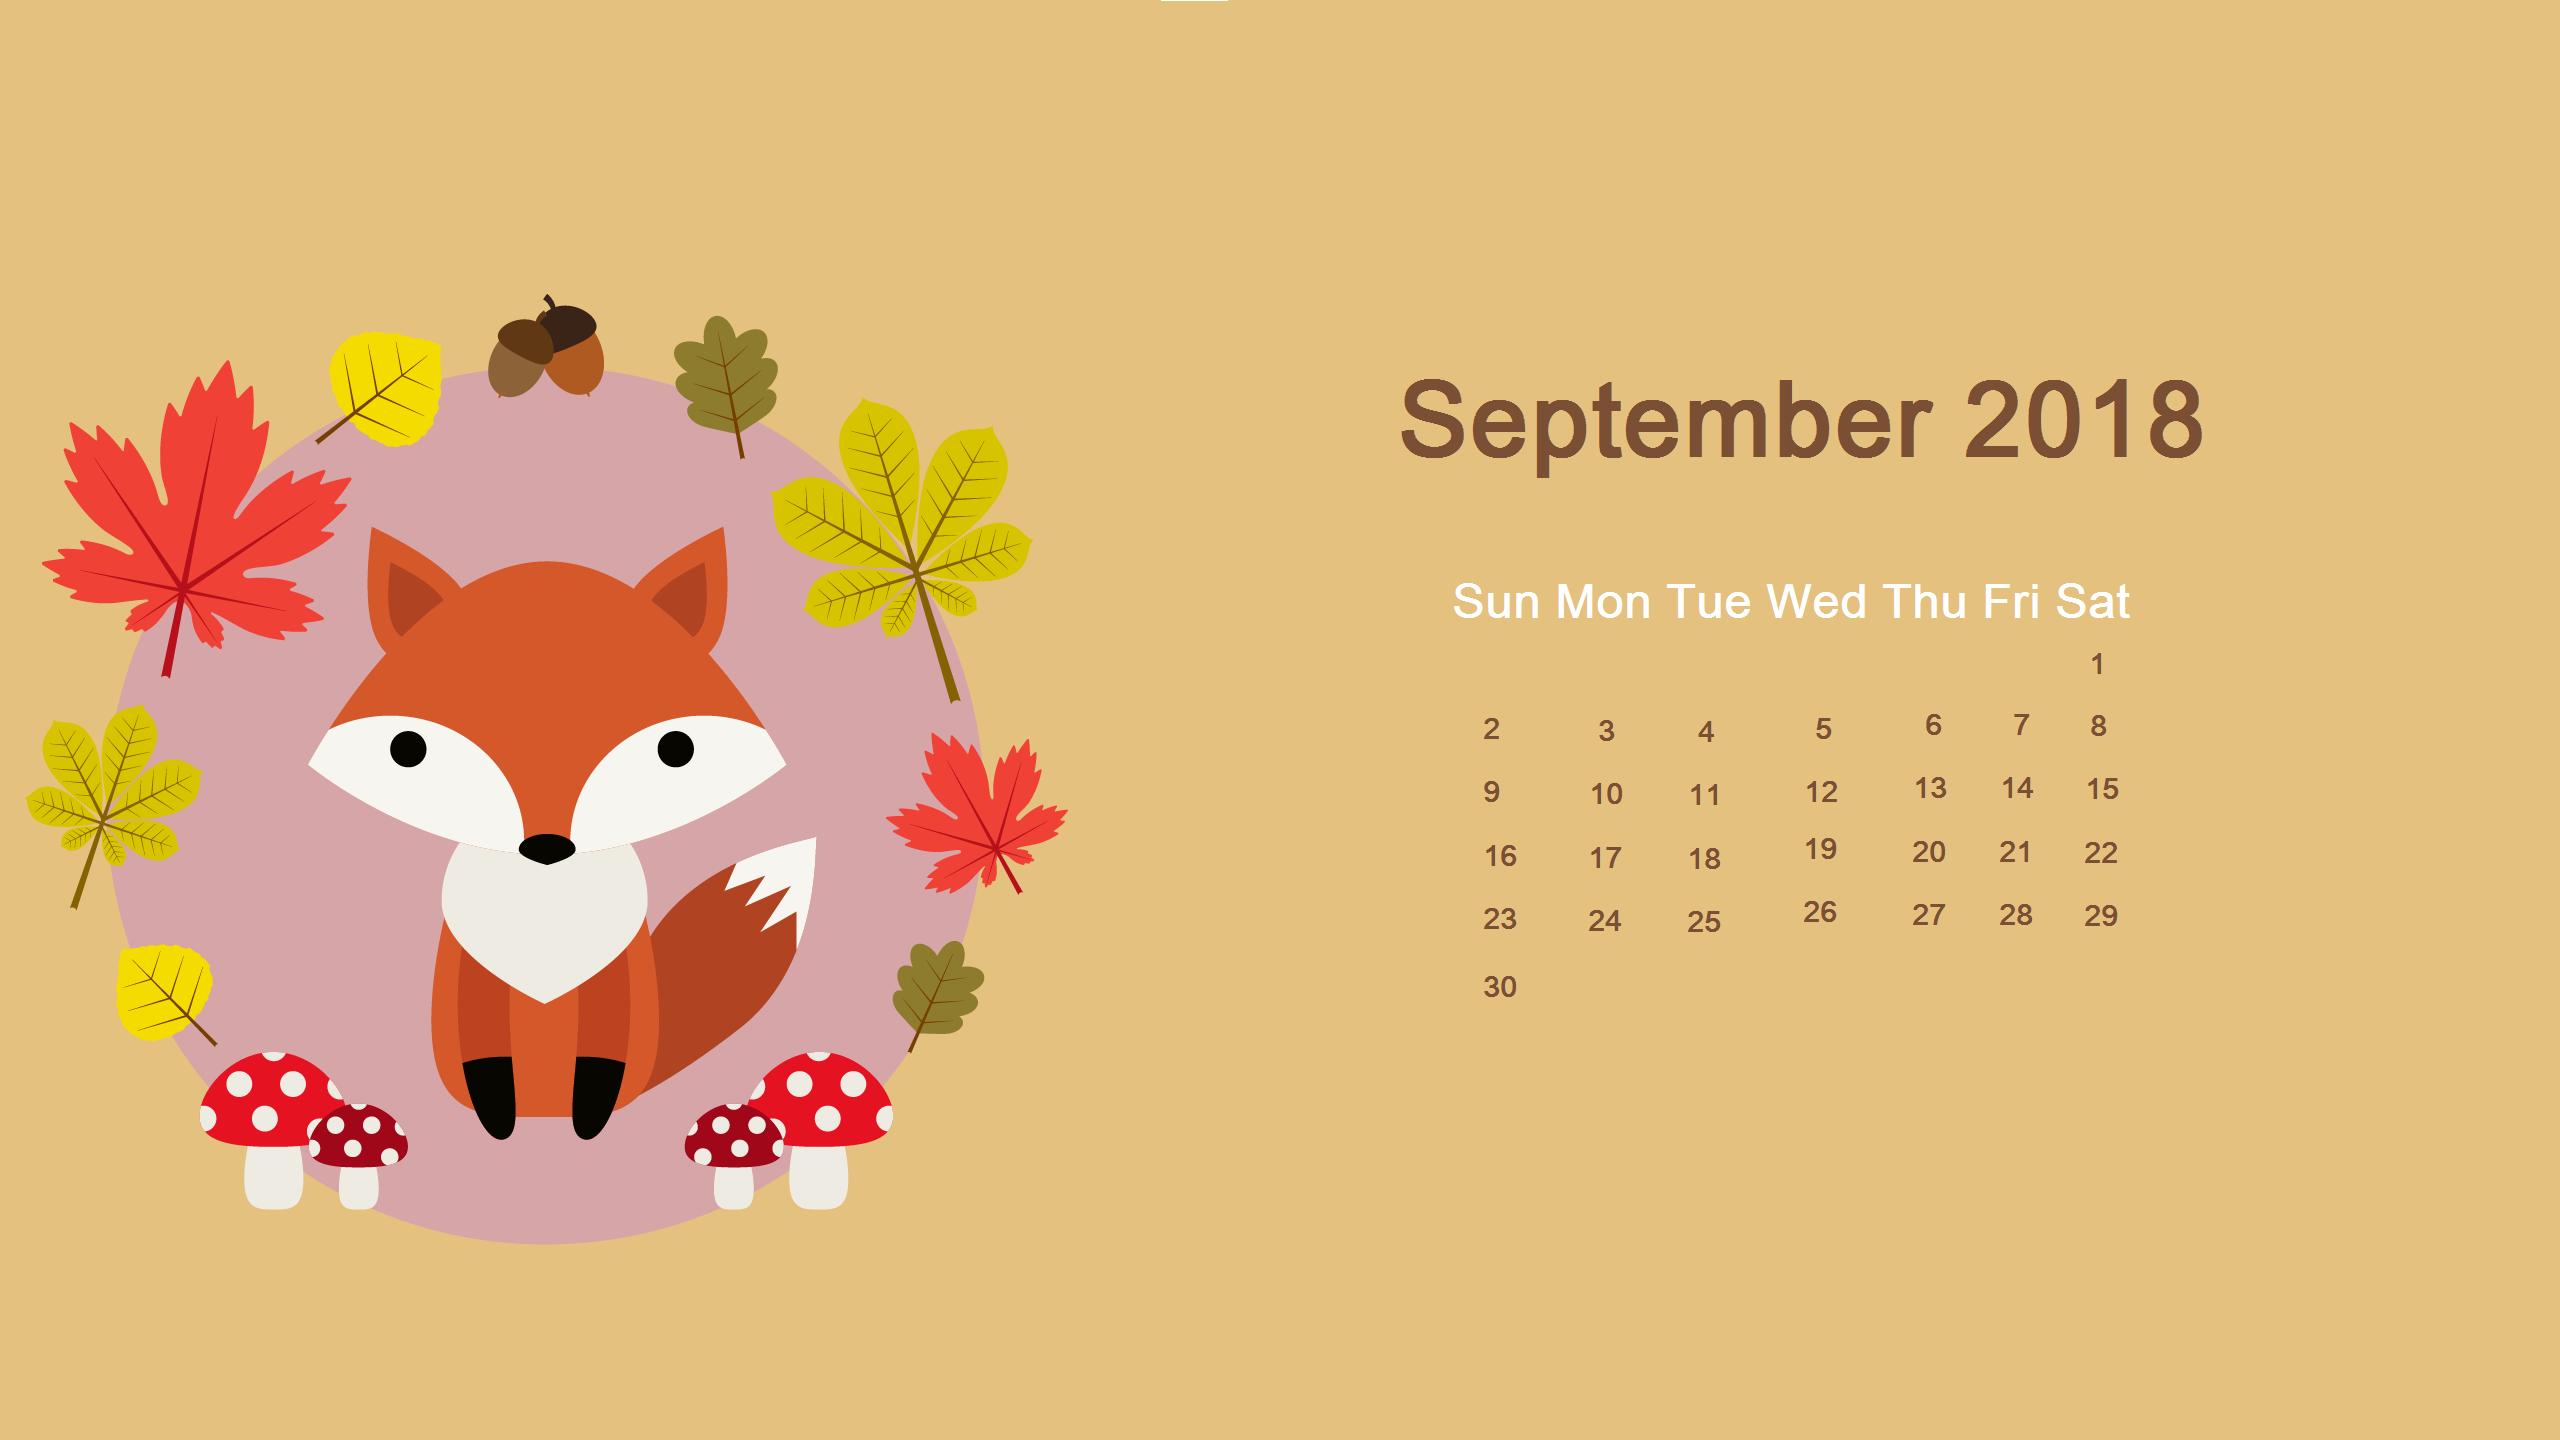 Cute September 2018 Calendar For Kids Calendar Wallpaper Kids Calendar September Wallpaper